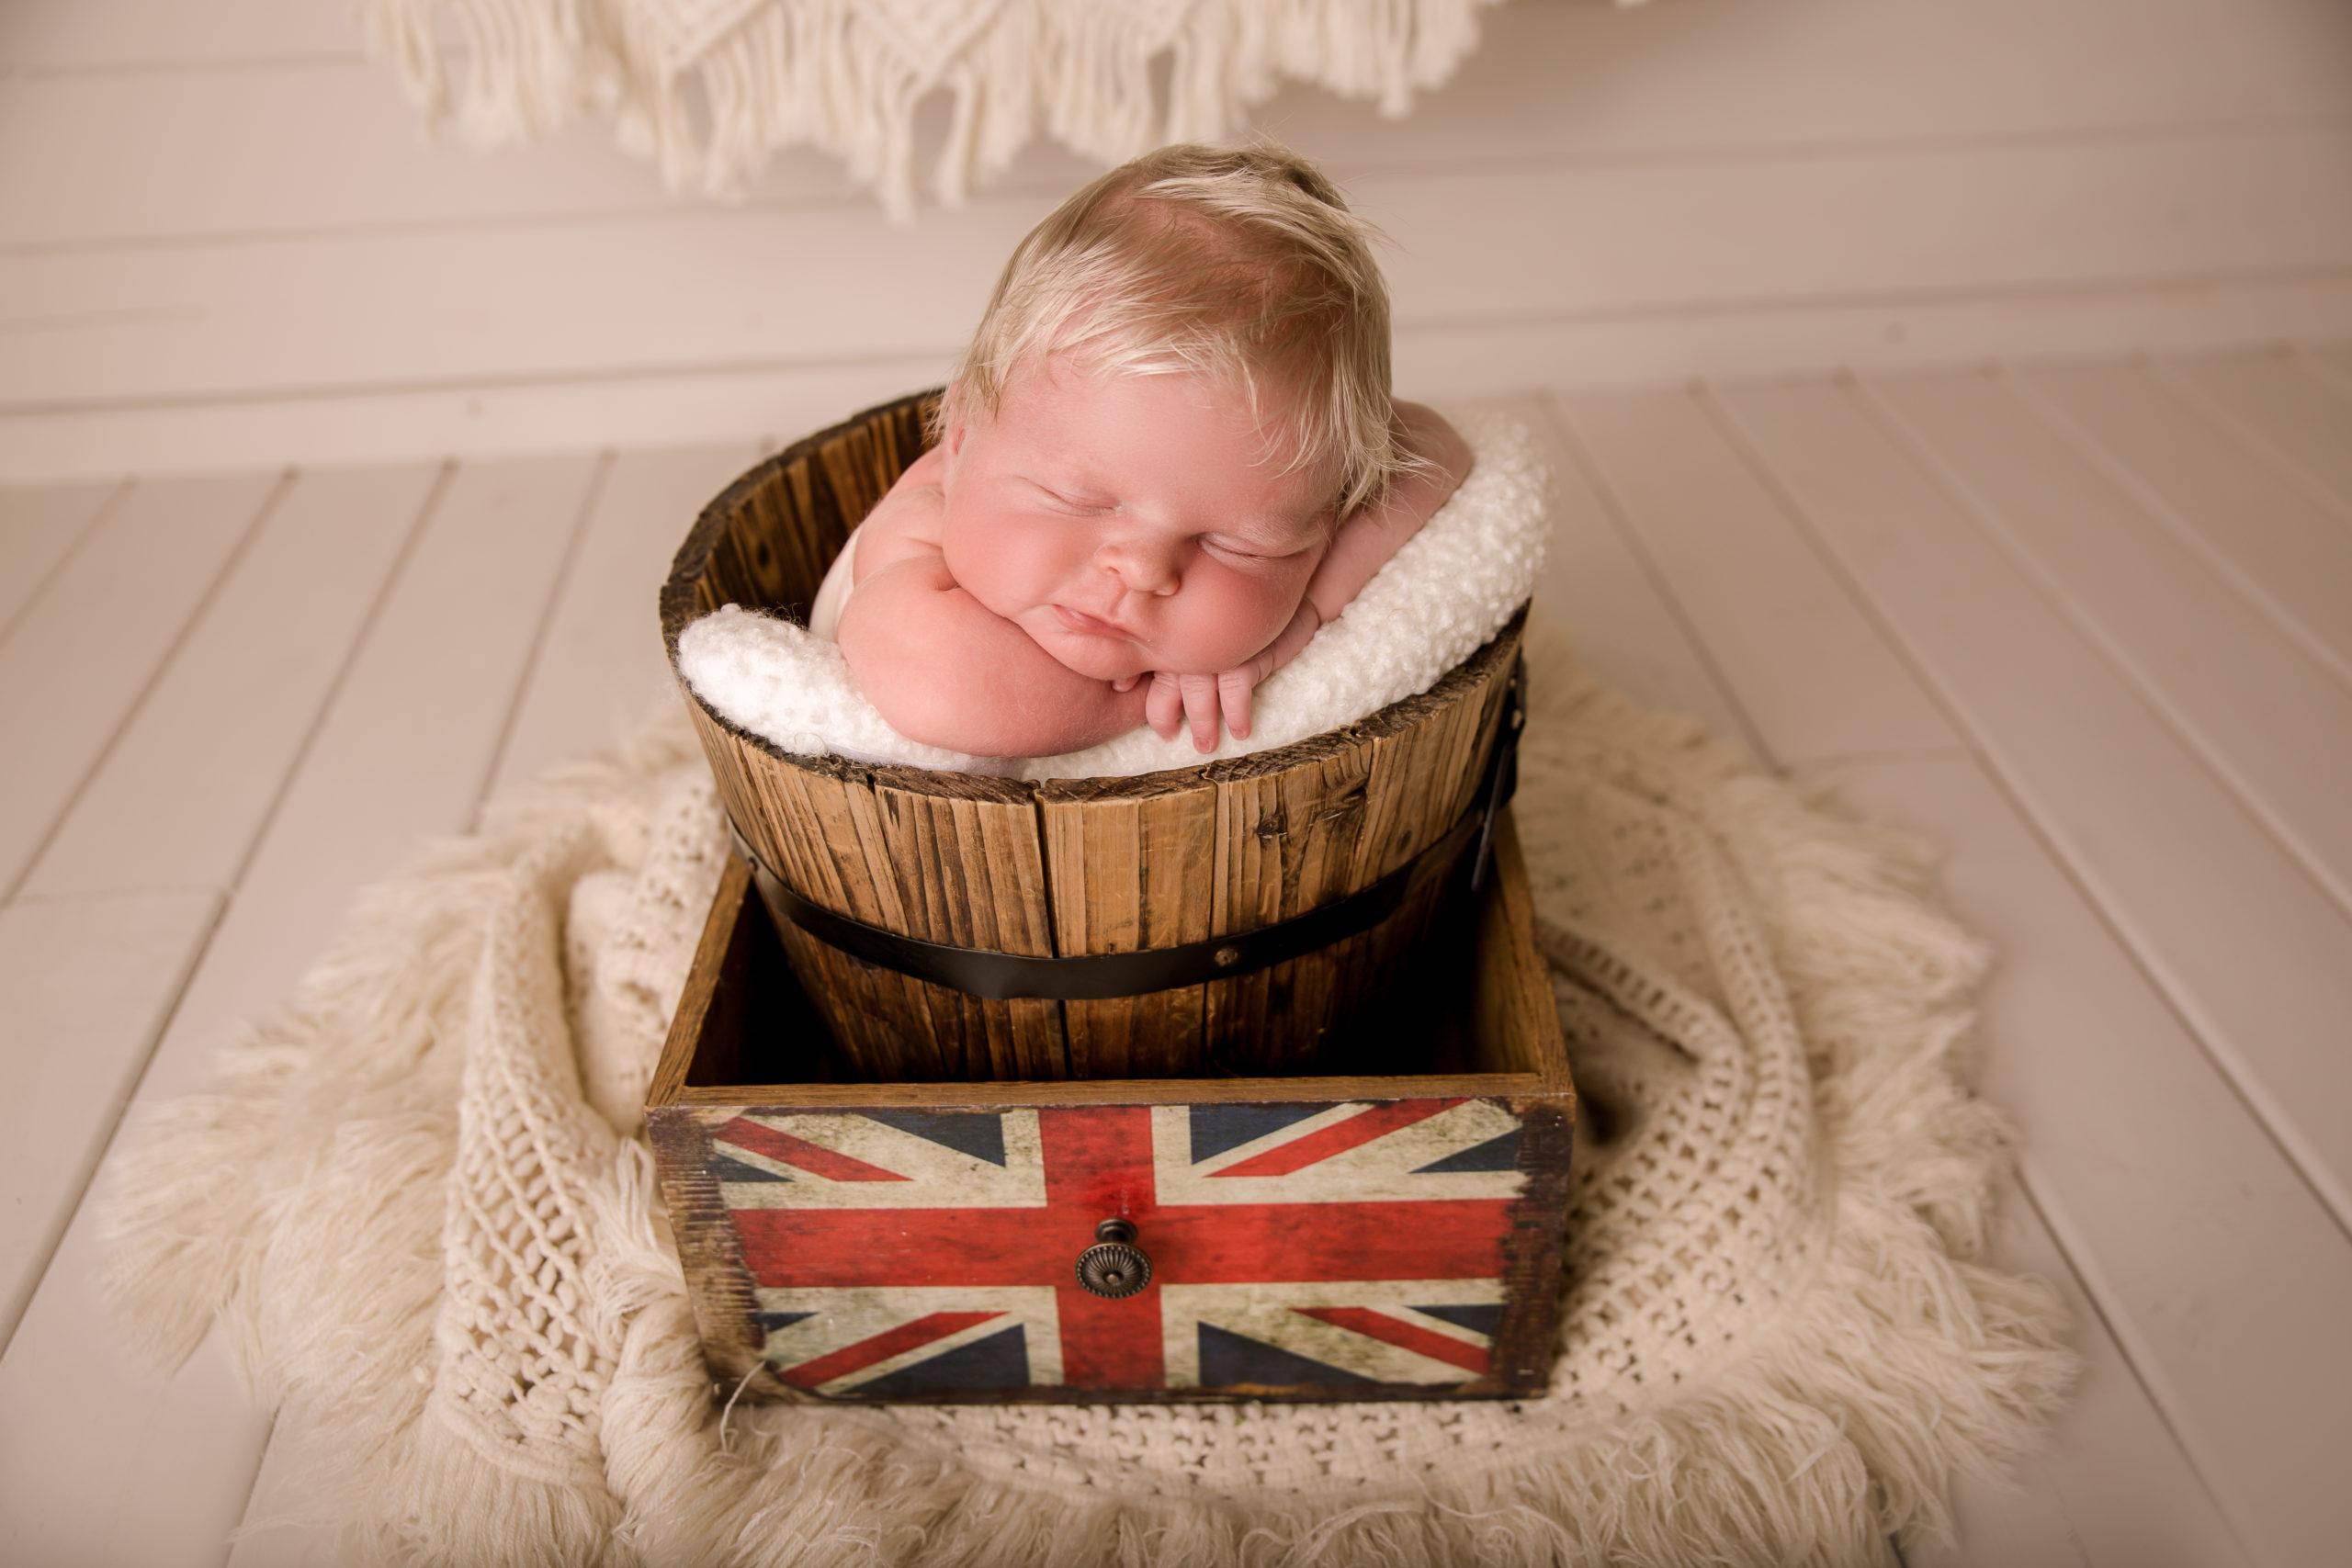 baby photography newborn boy in a bucket with British flag London photo studio in Wimbledon SW19